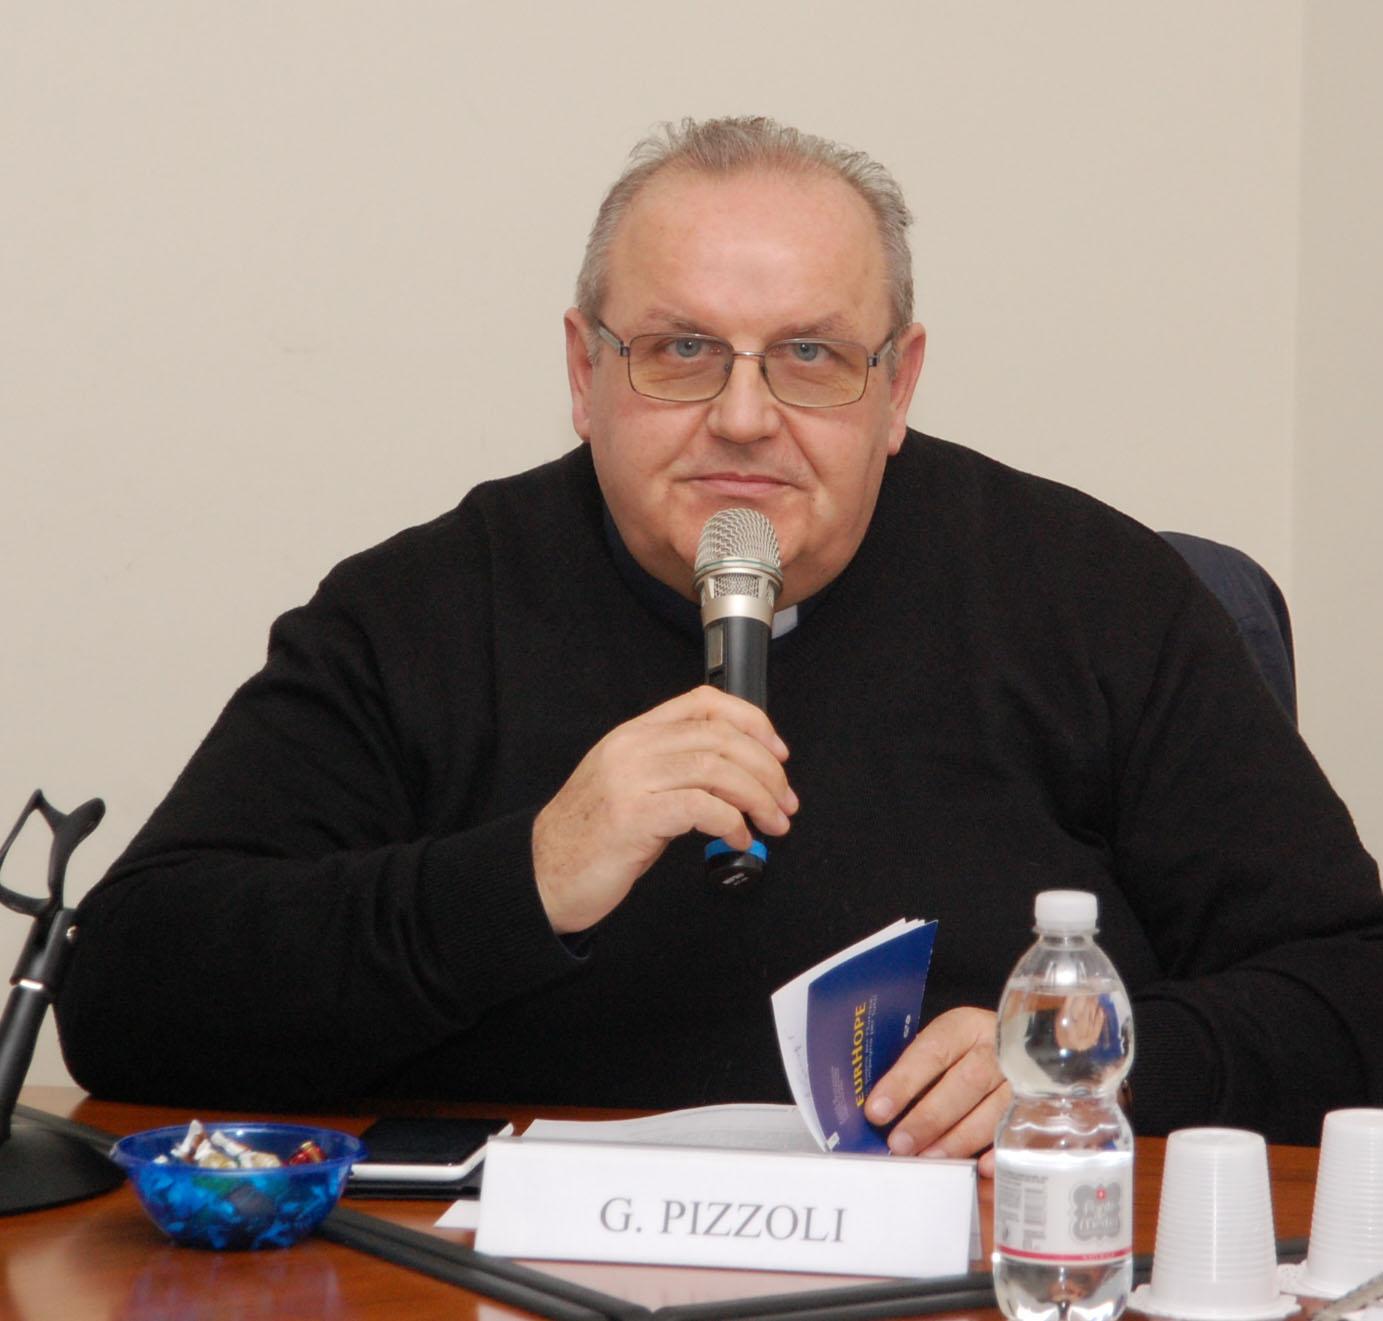 Giuseppe Pizzoli